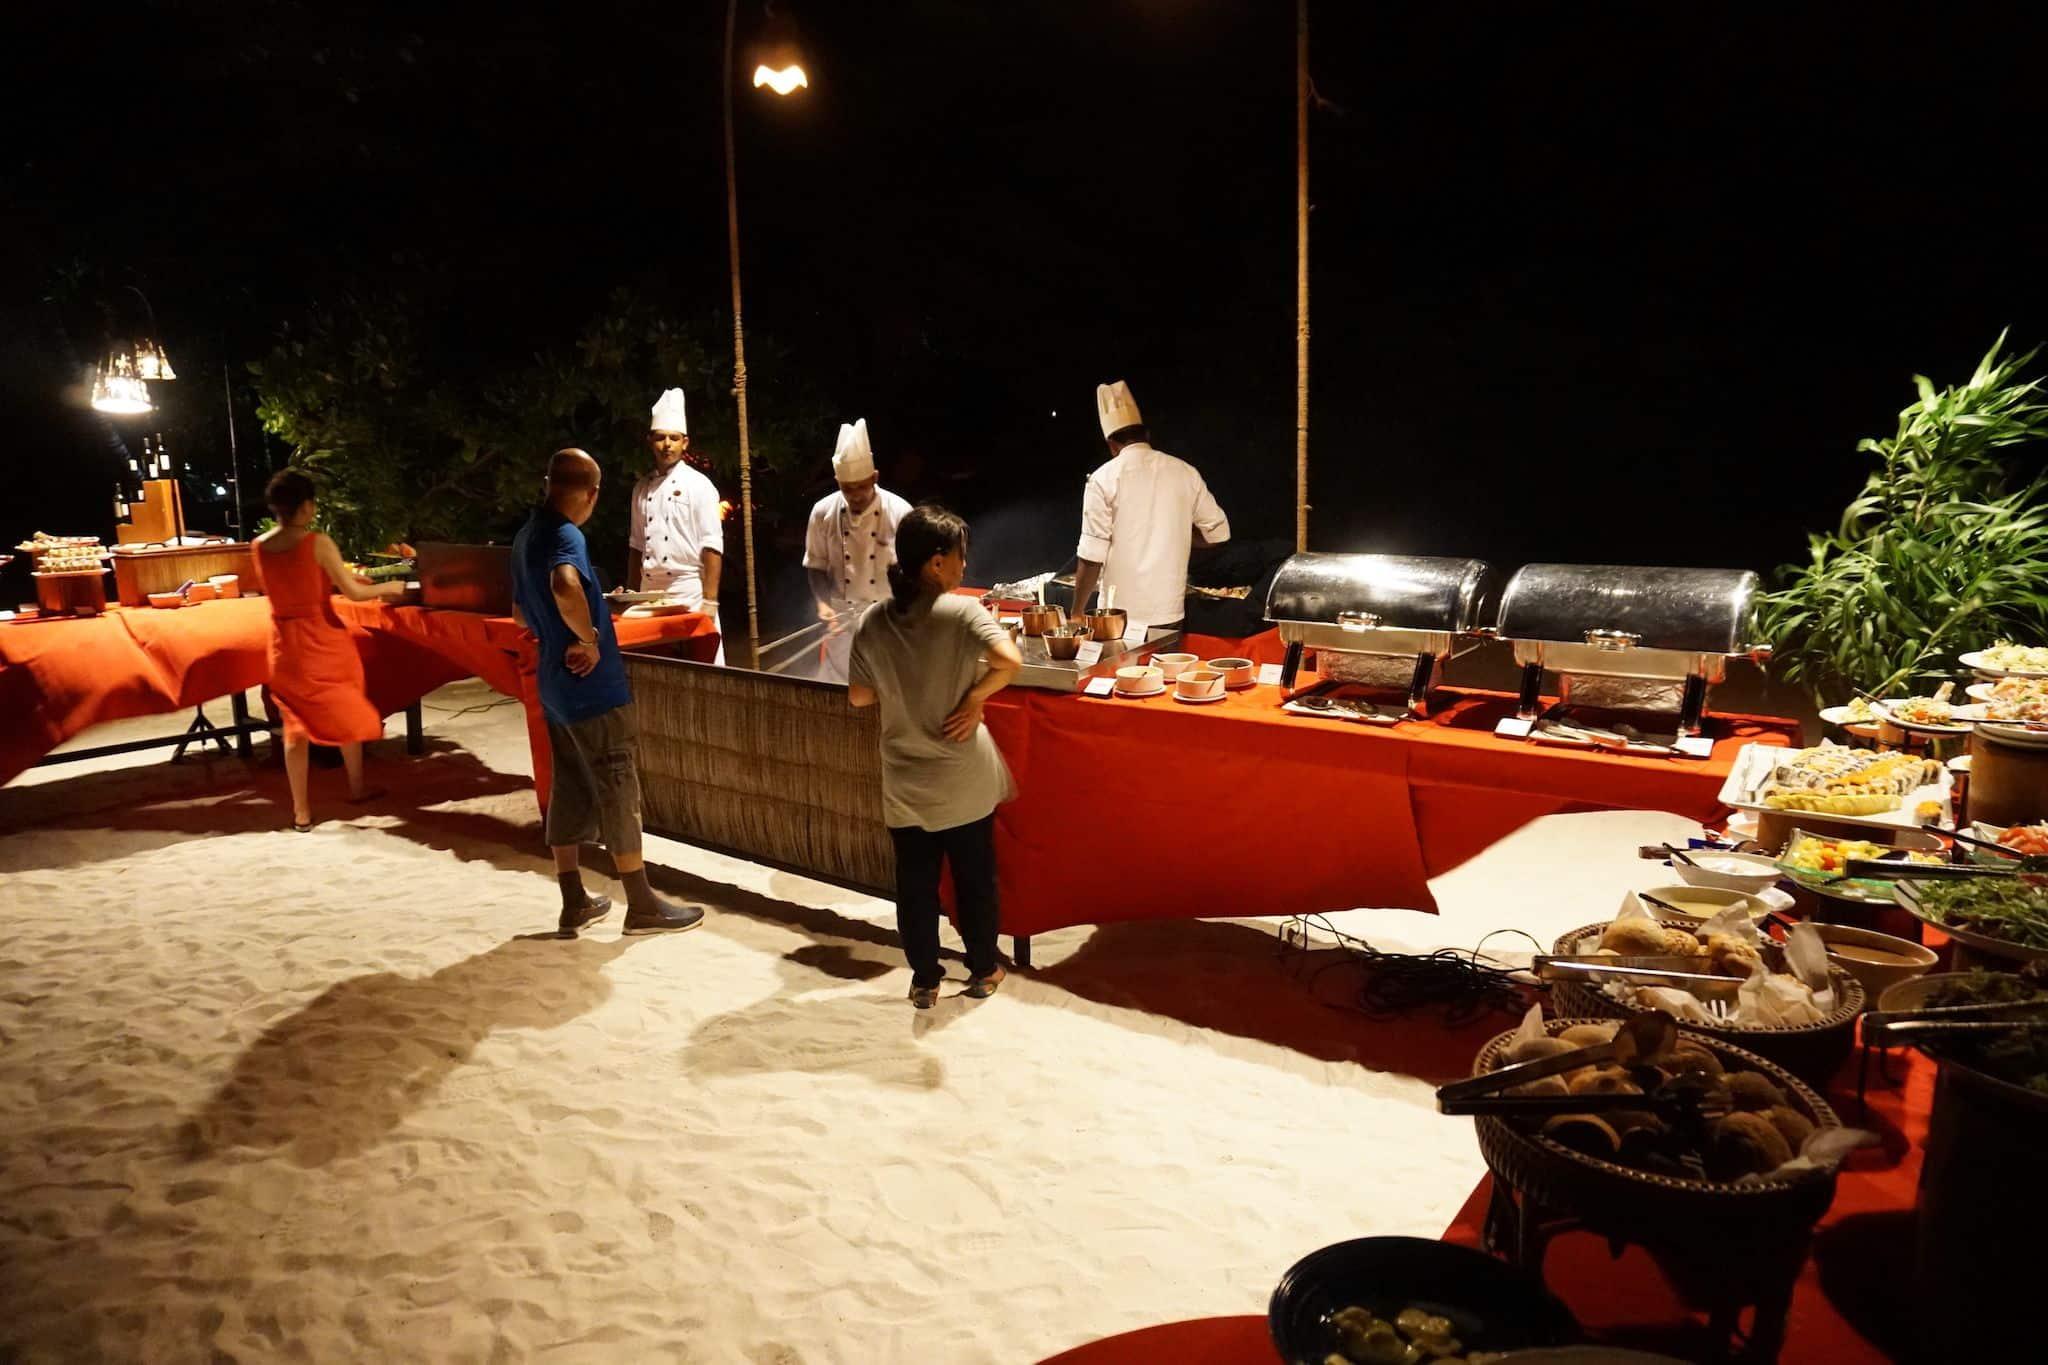 Dinner am Strand auf Coco Bodu Hithi. Foto: Sascha Tegtmeyer